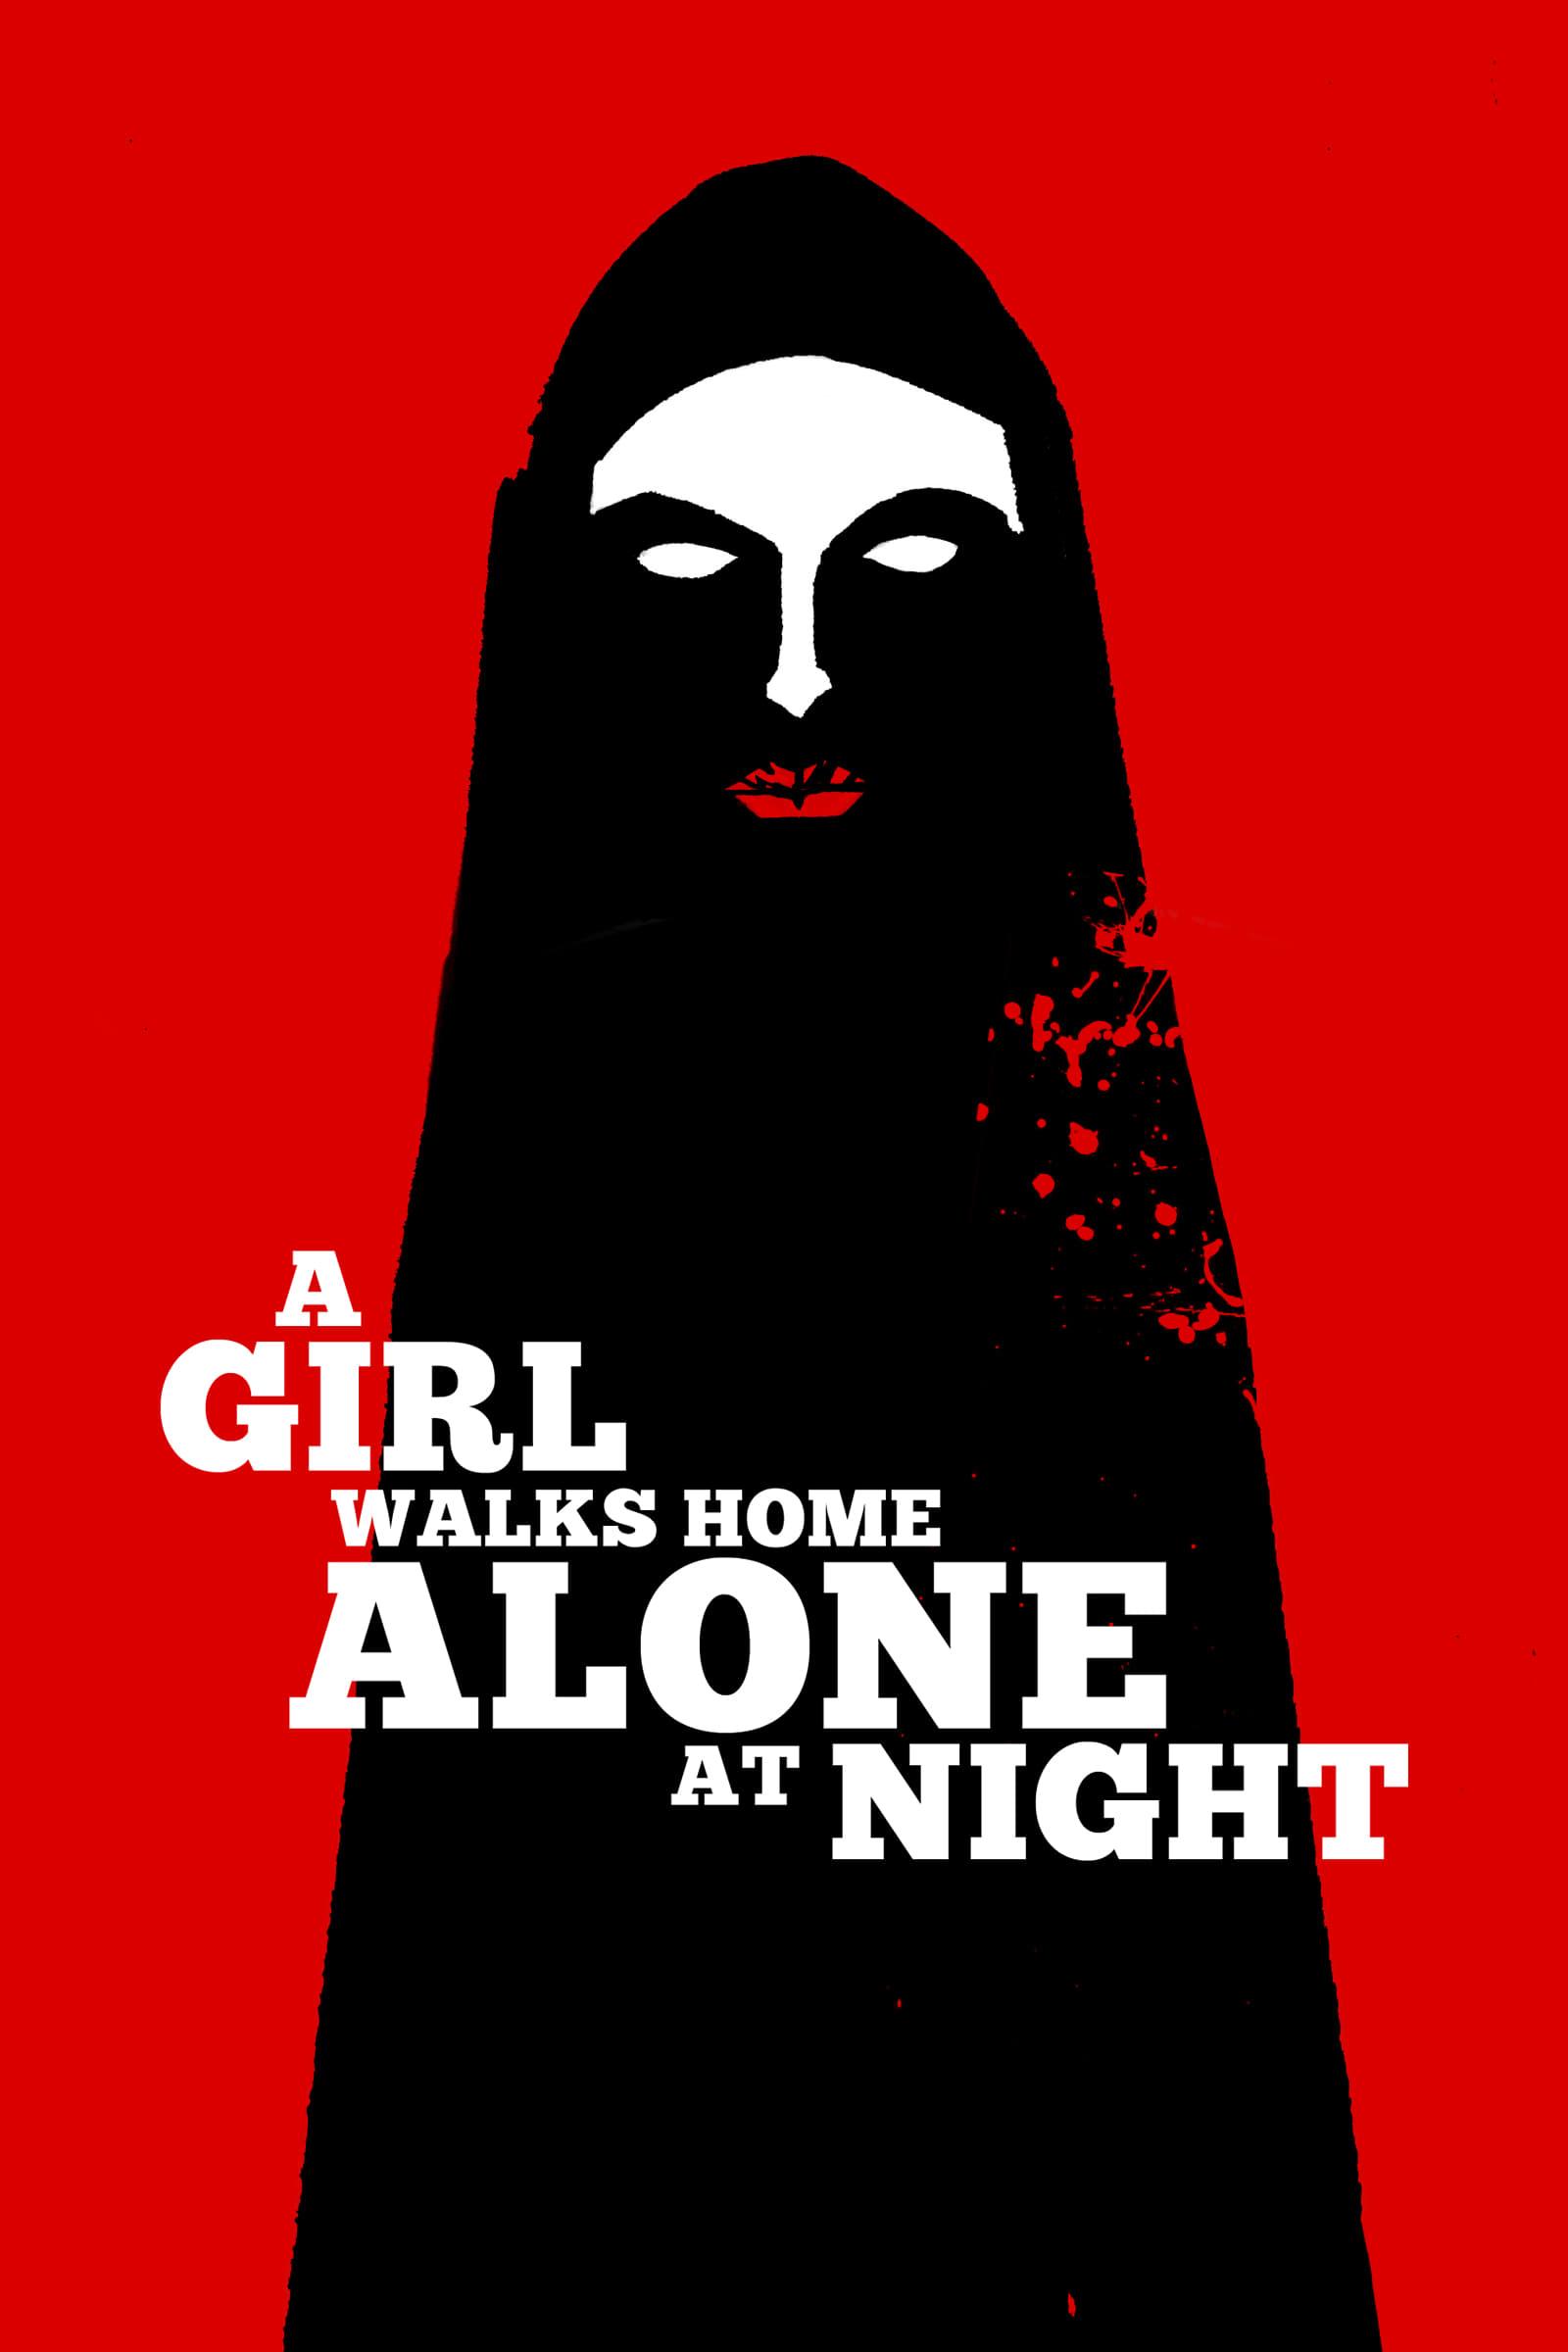 Regarder A Girl Walks Home Alone at Night en streaming gratuit